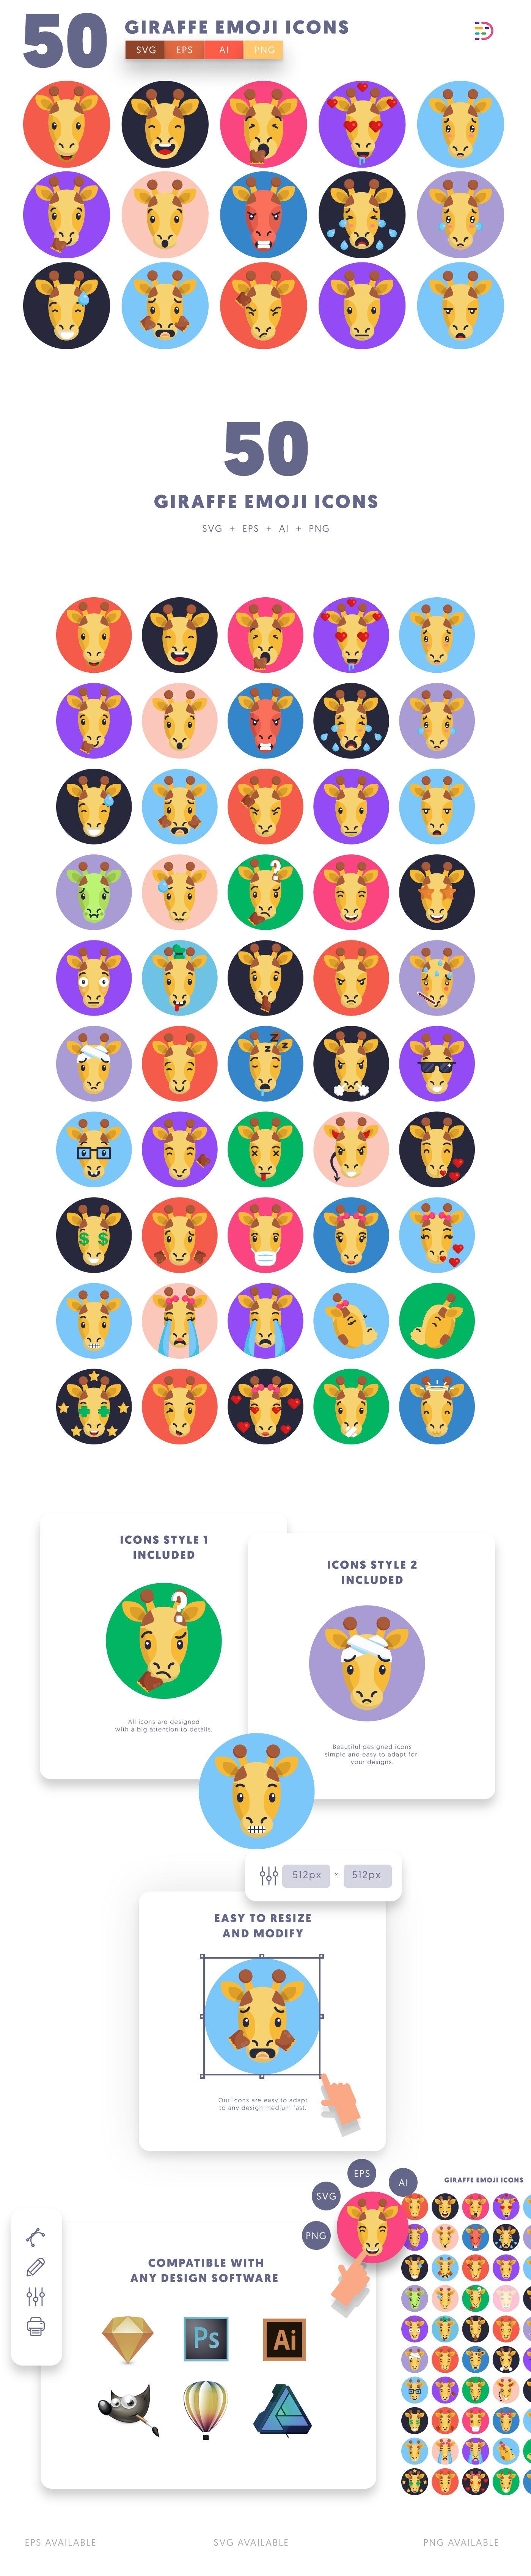 Giraffe Emoji icons info graphic